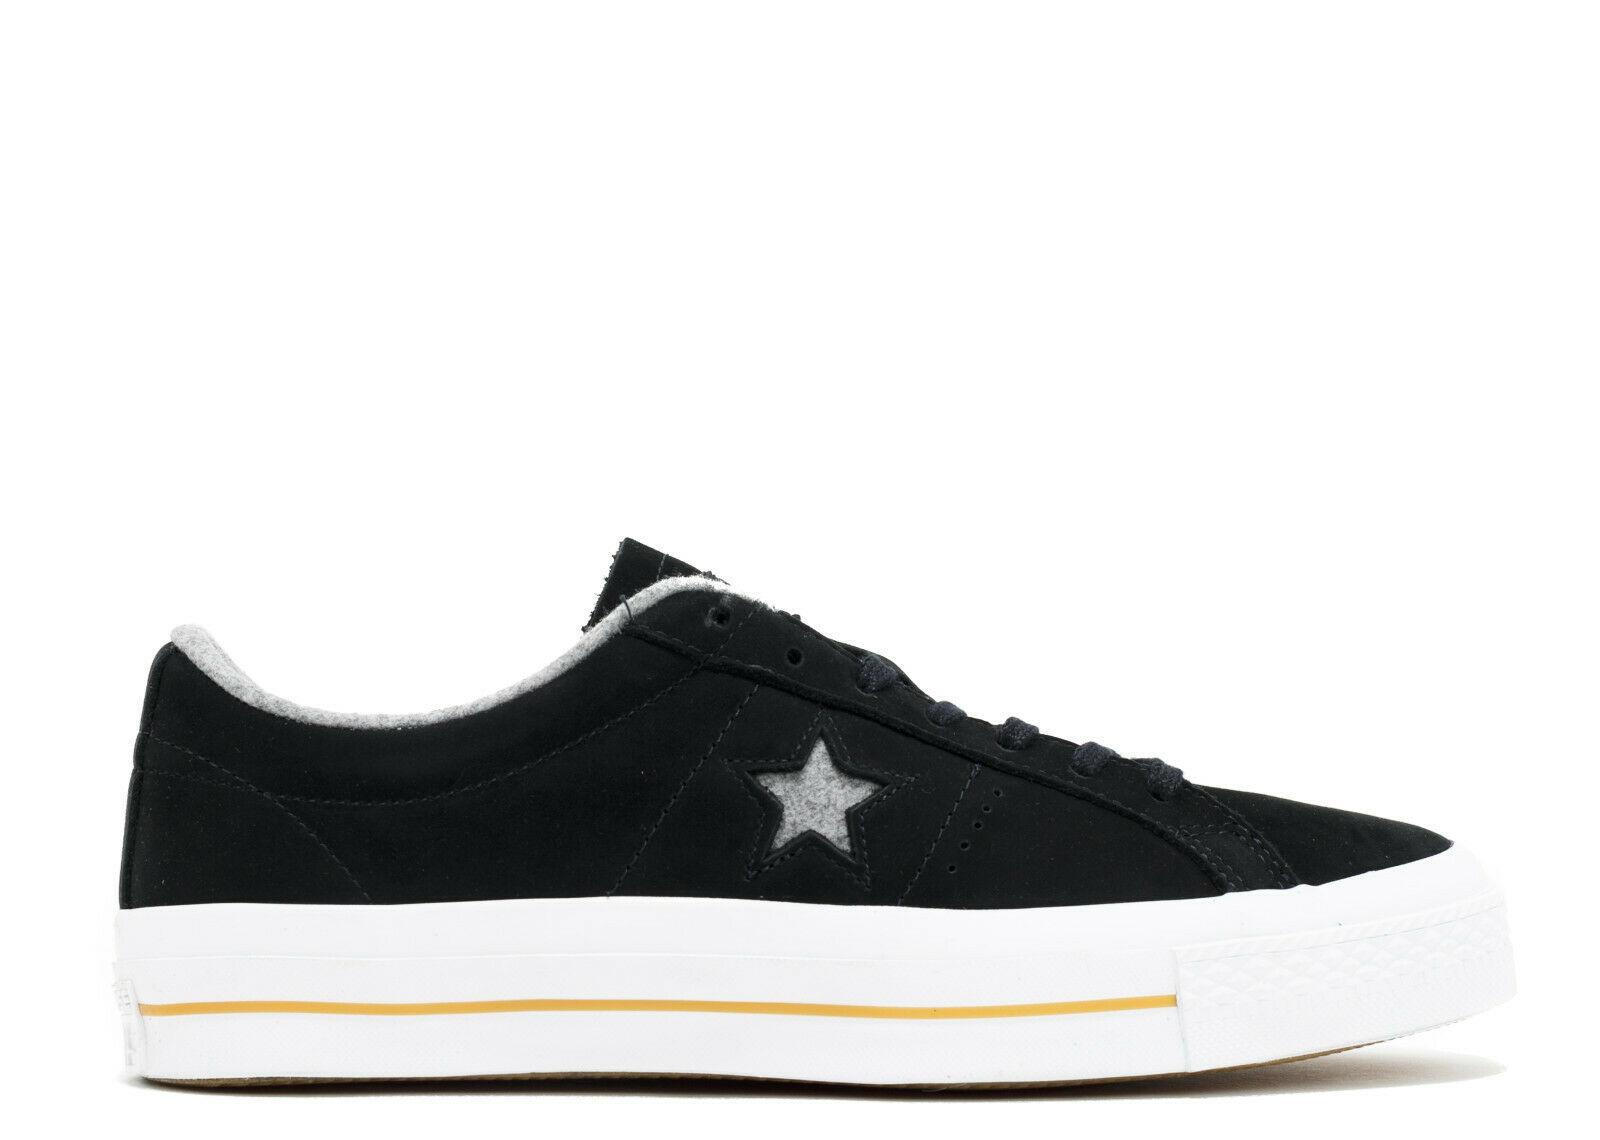 Converse Mens One Star Nubuck Ox Leather 153717C Black/Ash Grey/Gum Size 10